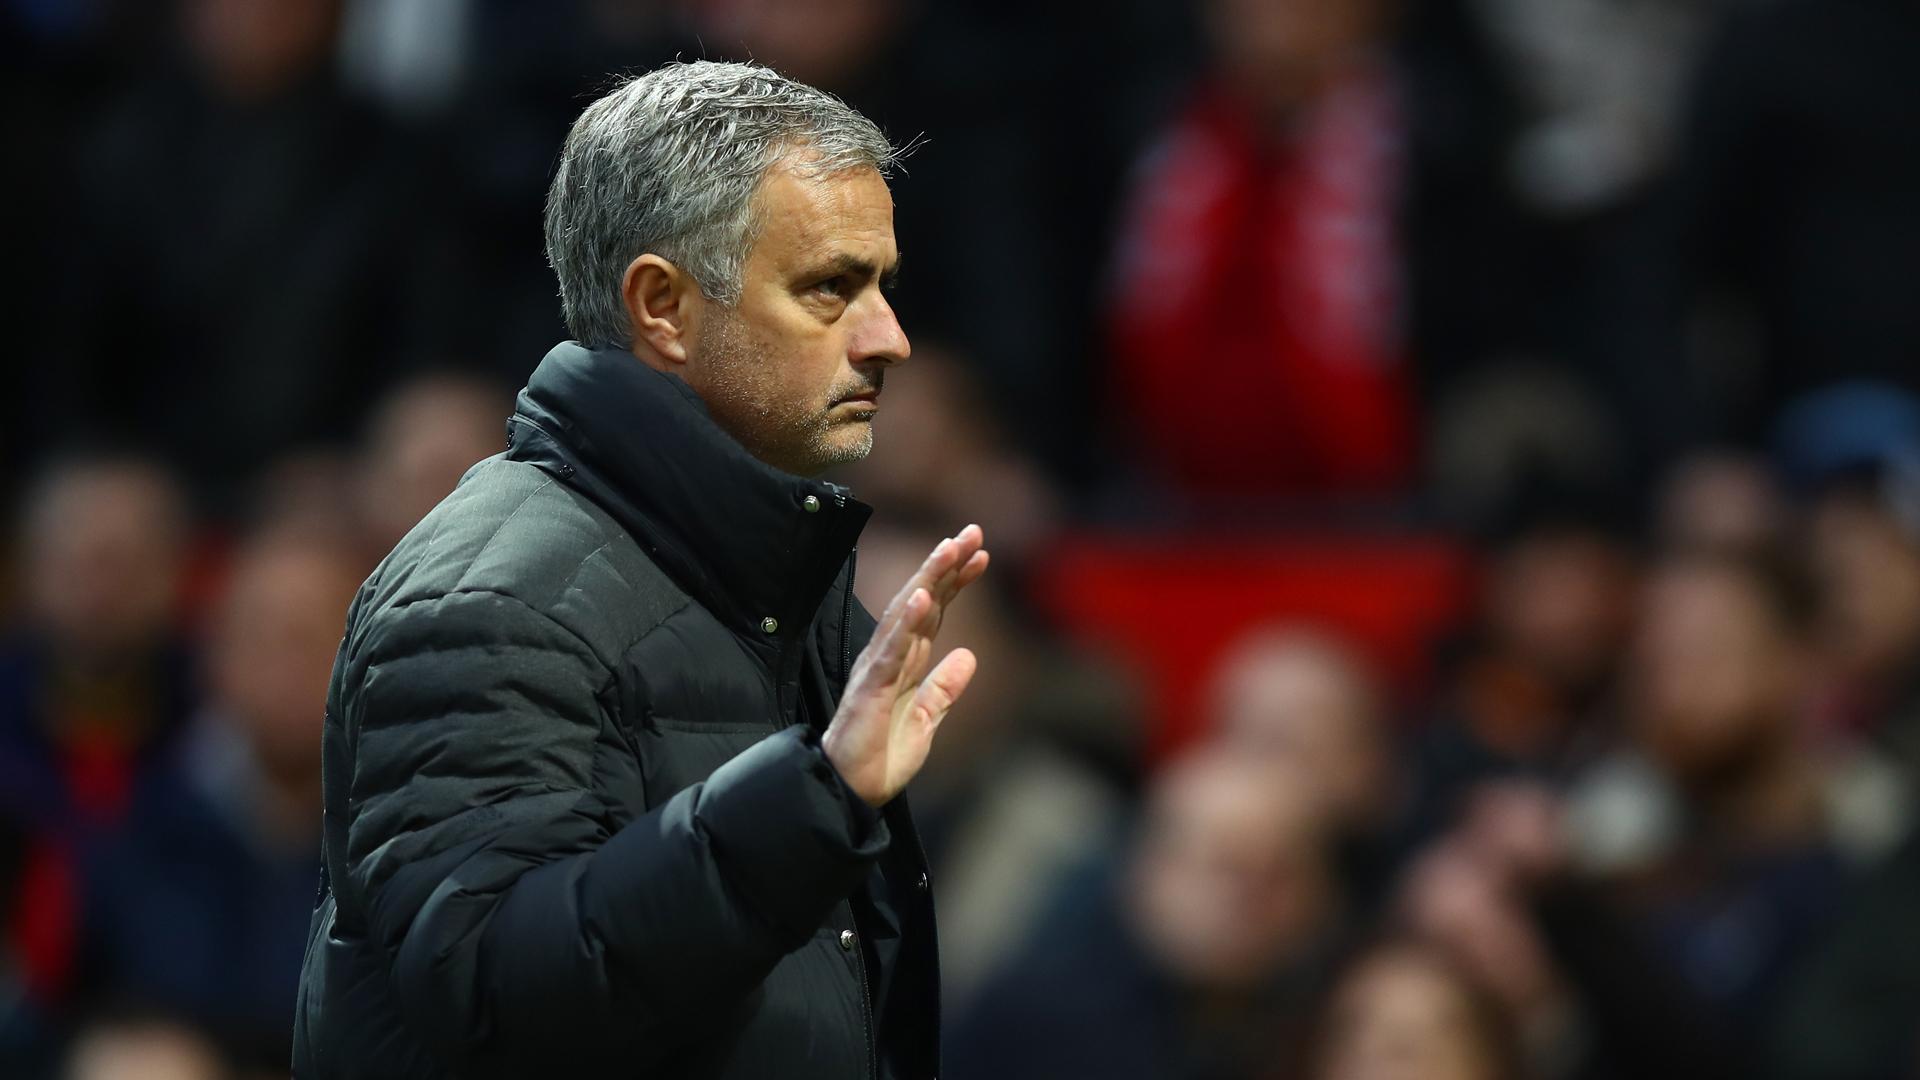 [Image: jose-mourinho-manchester-united_uwfhfs8a...-264519920]